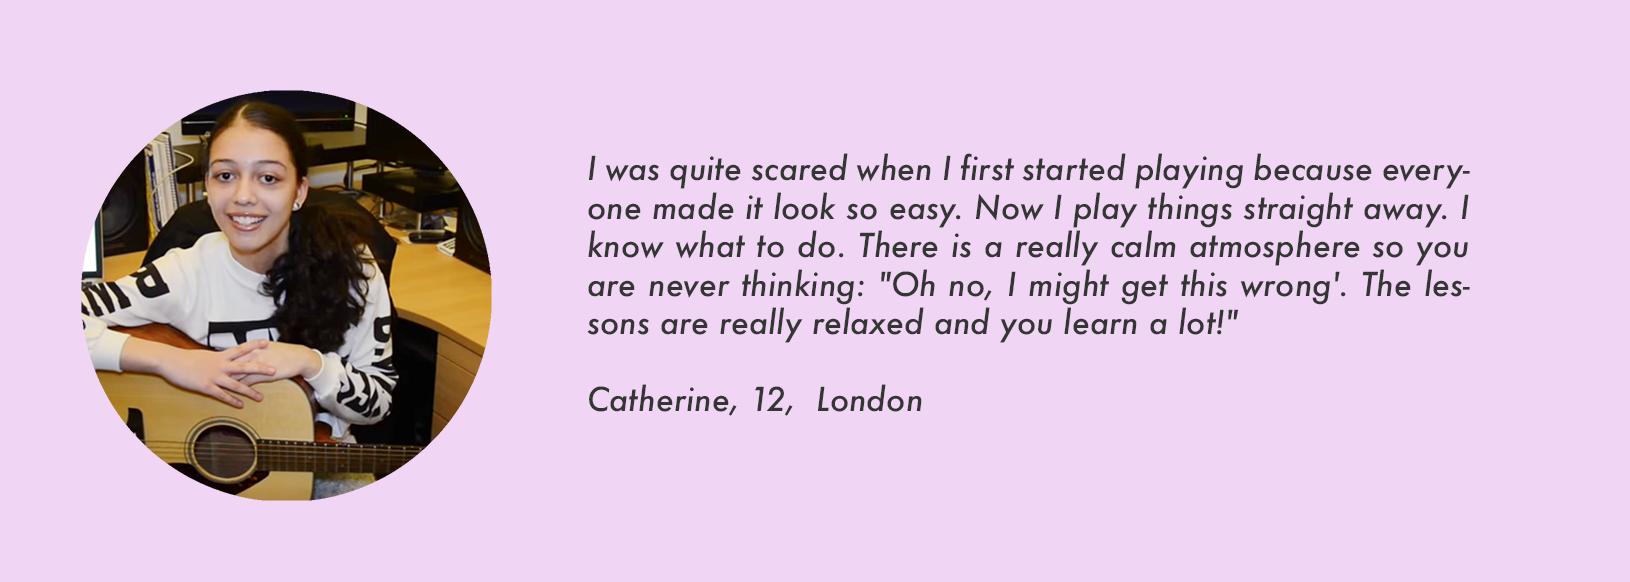 Catherine testimonial.png